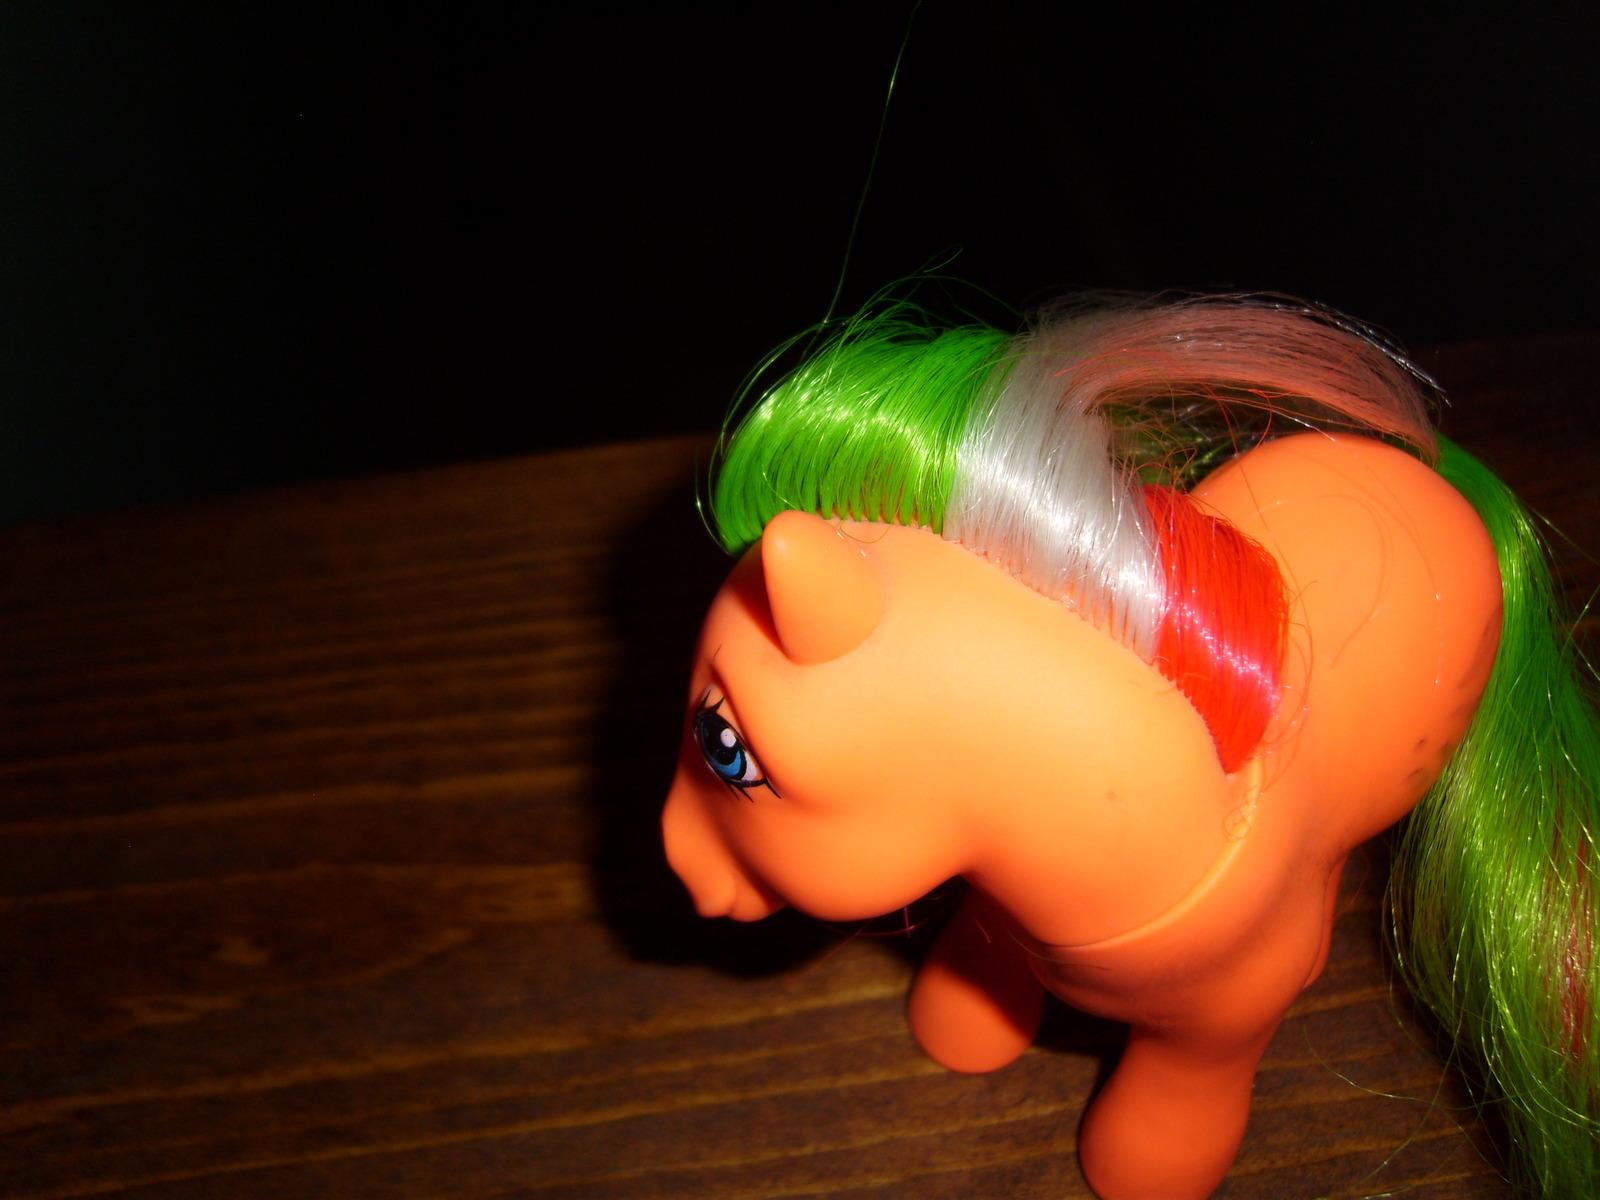 My Little Pony G1 Argie Windy (green hair) image 5